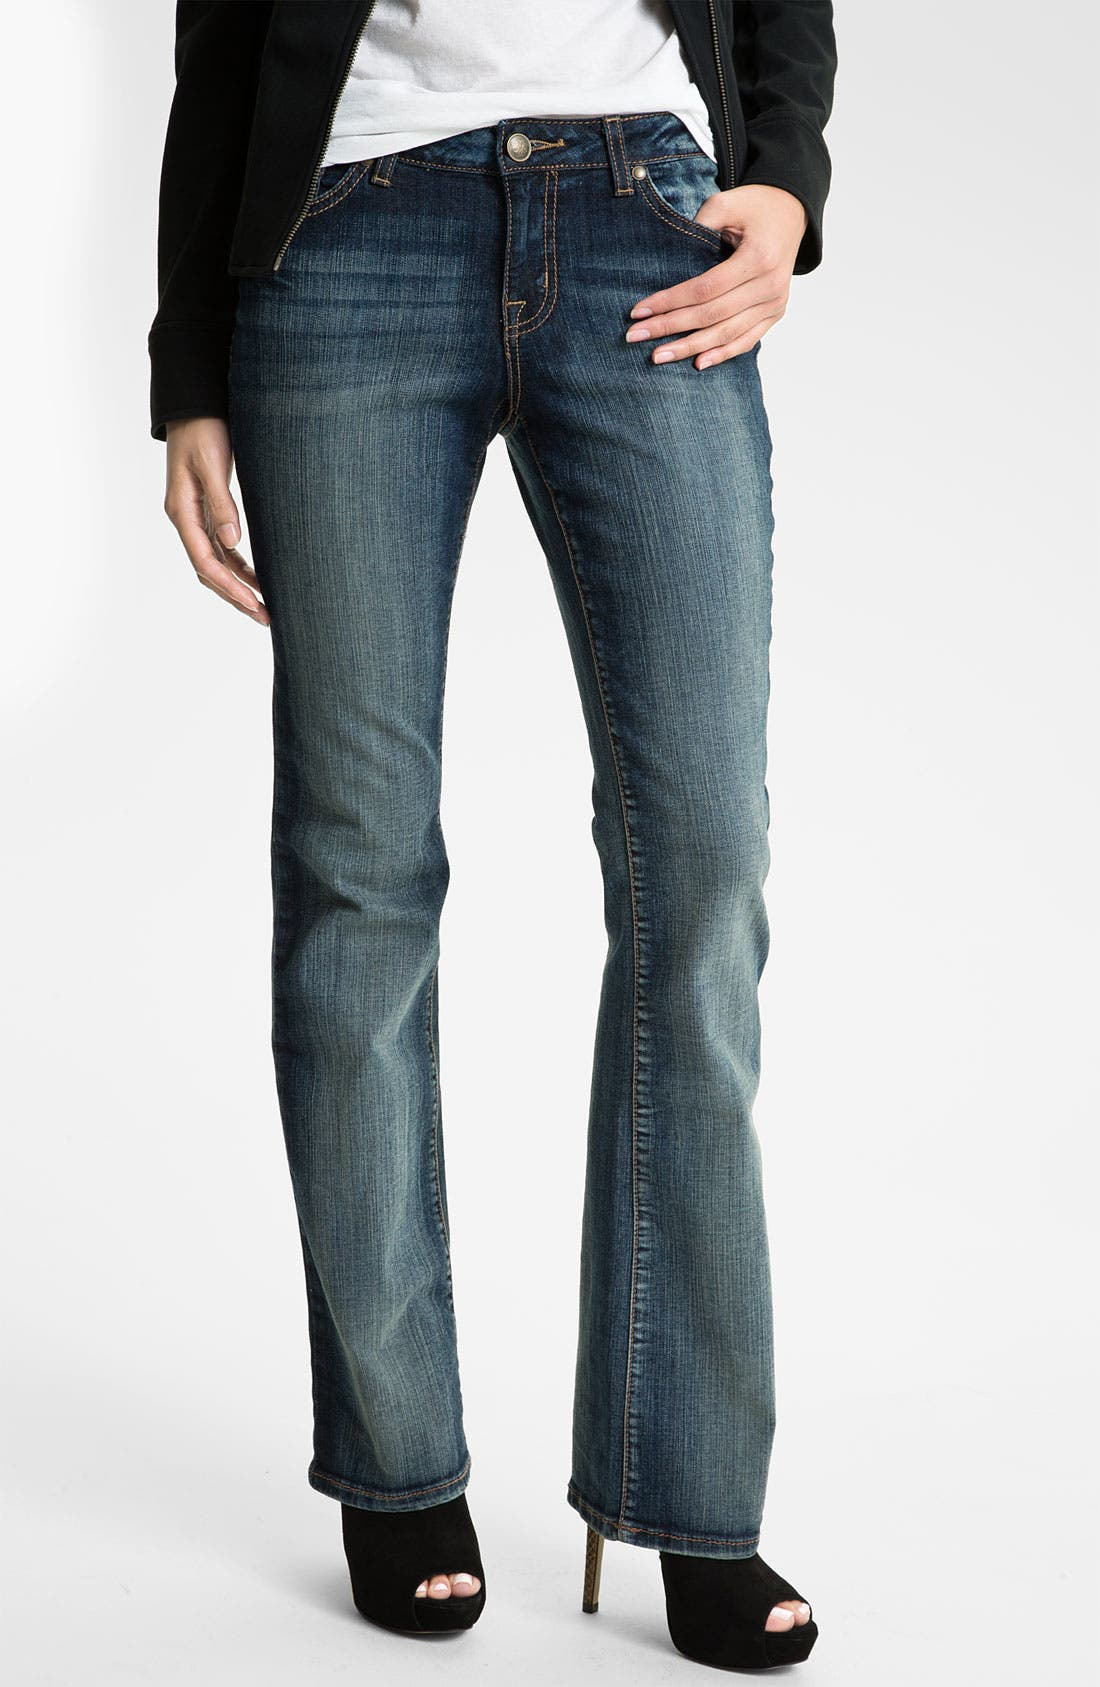 Alternate Image 1 Selected - Jessica Simpson 'Rockin' Curvy Bootcut Jeans (Blitzen) (Online Only)